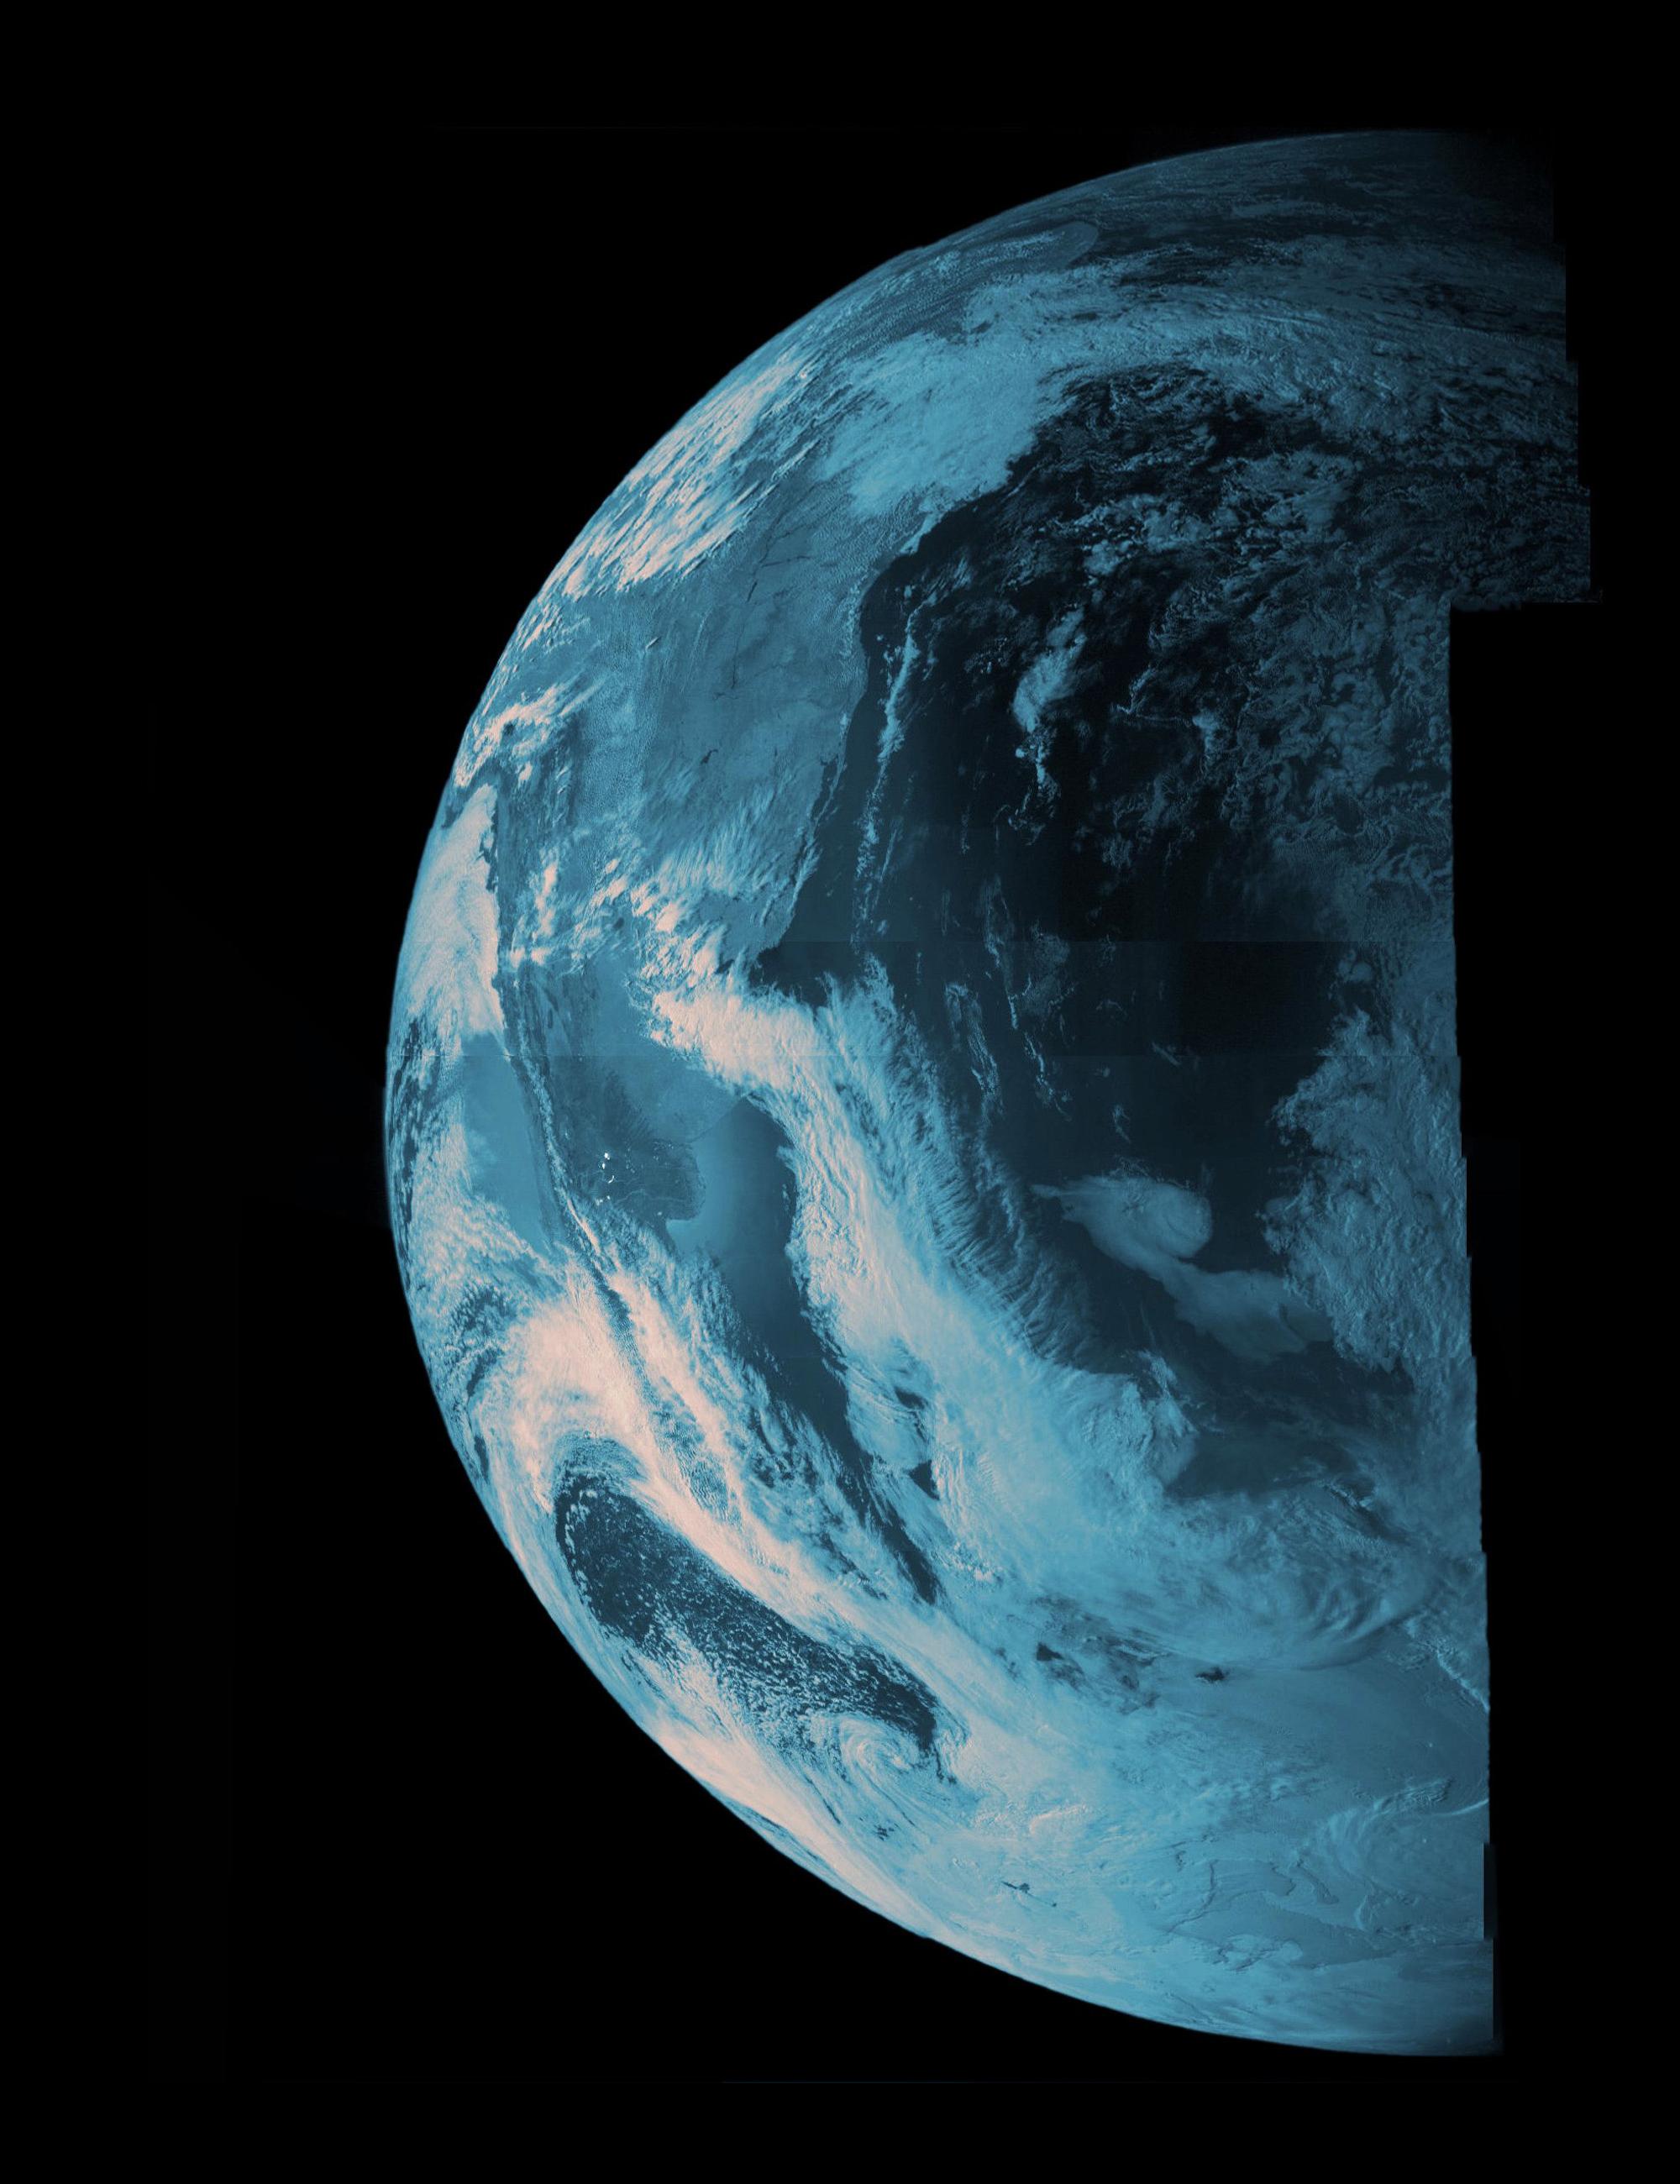 EFB-11_4C_Juno-Earth-mosaic_Ken-Kremer-